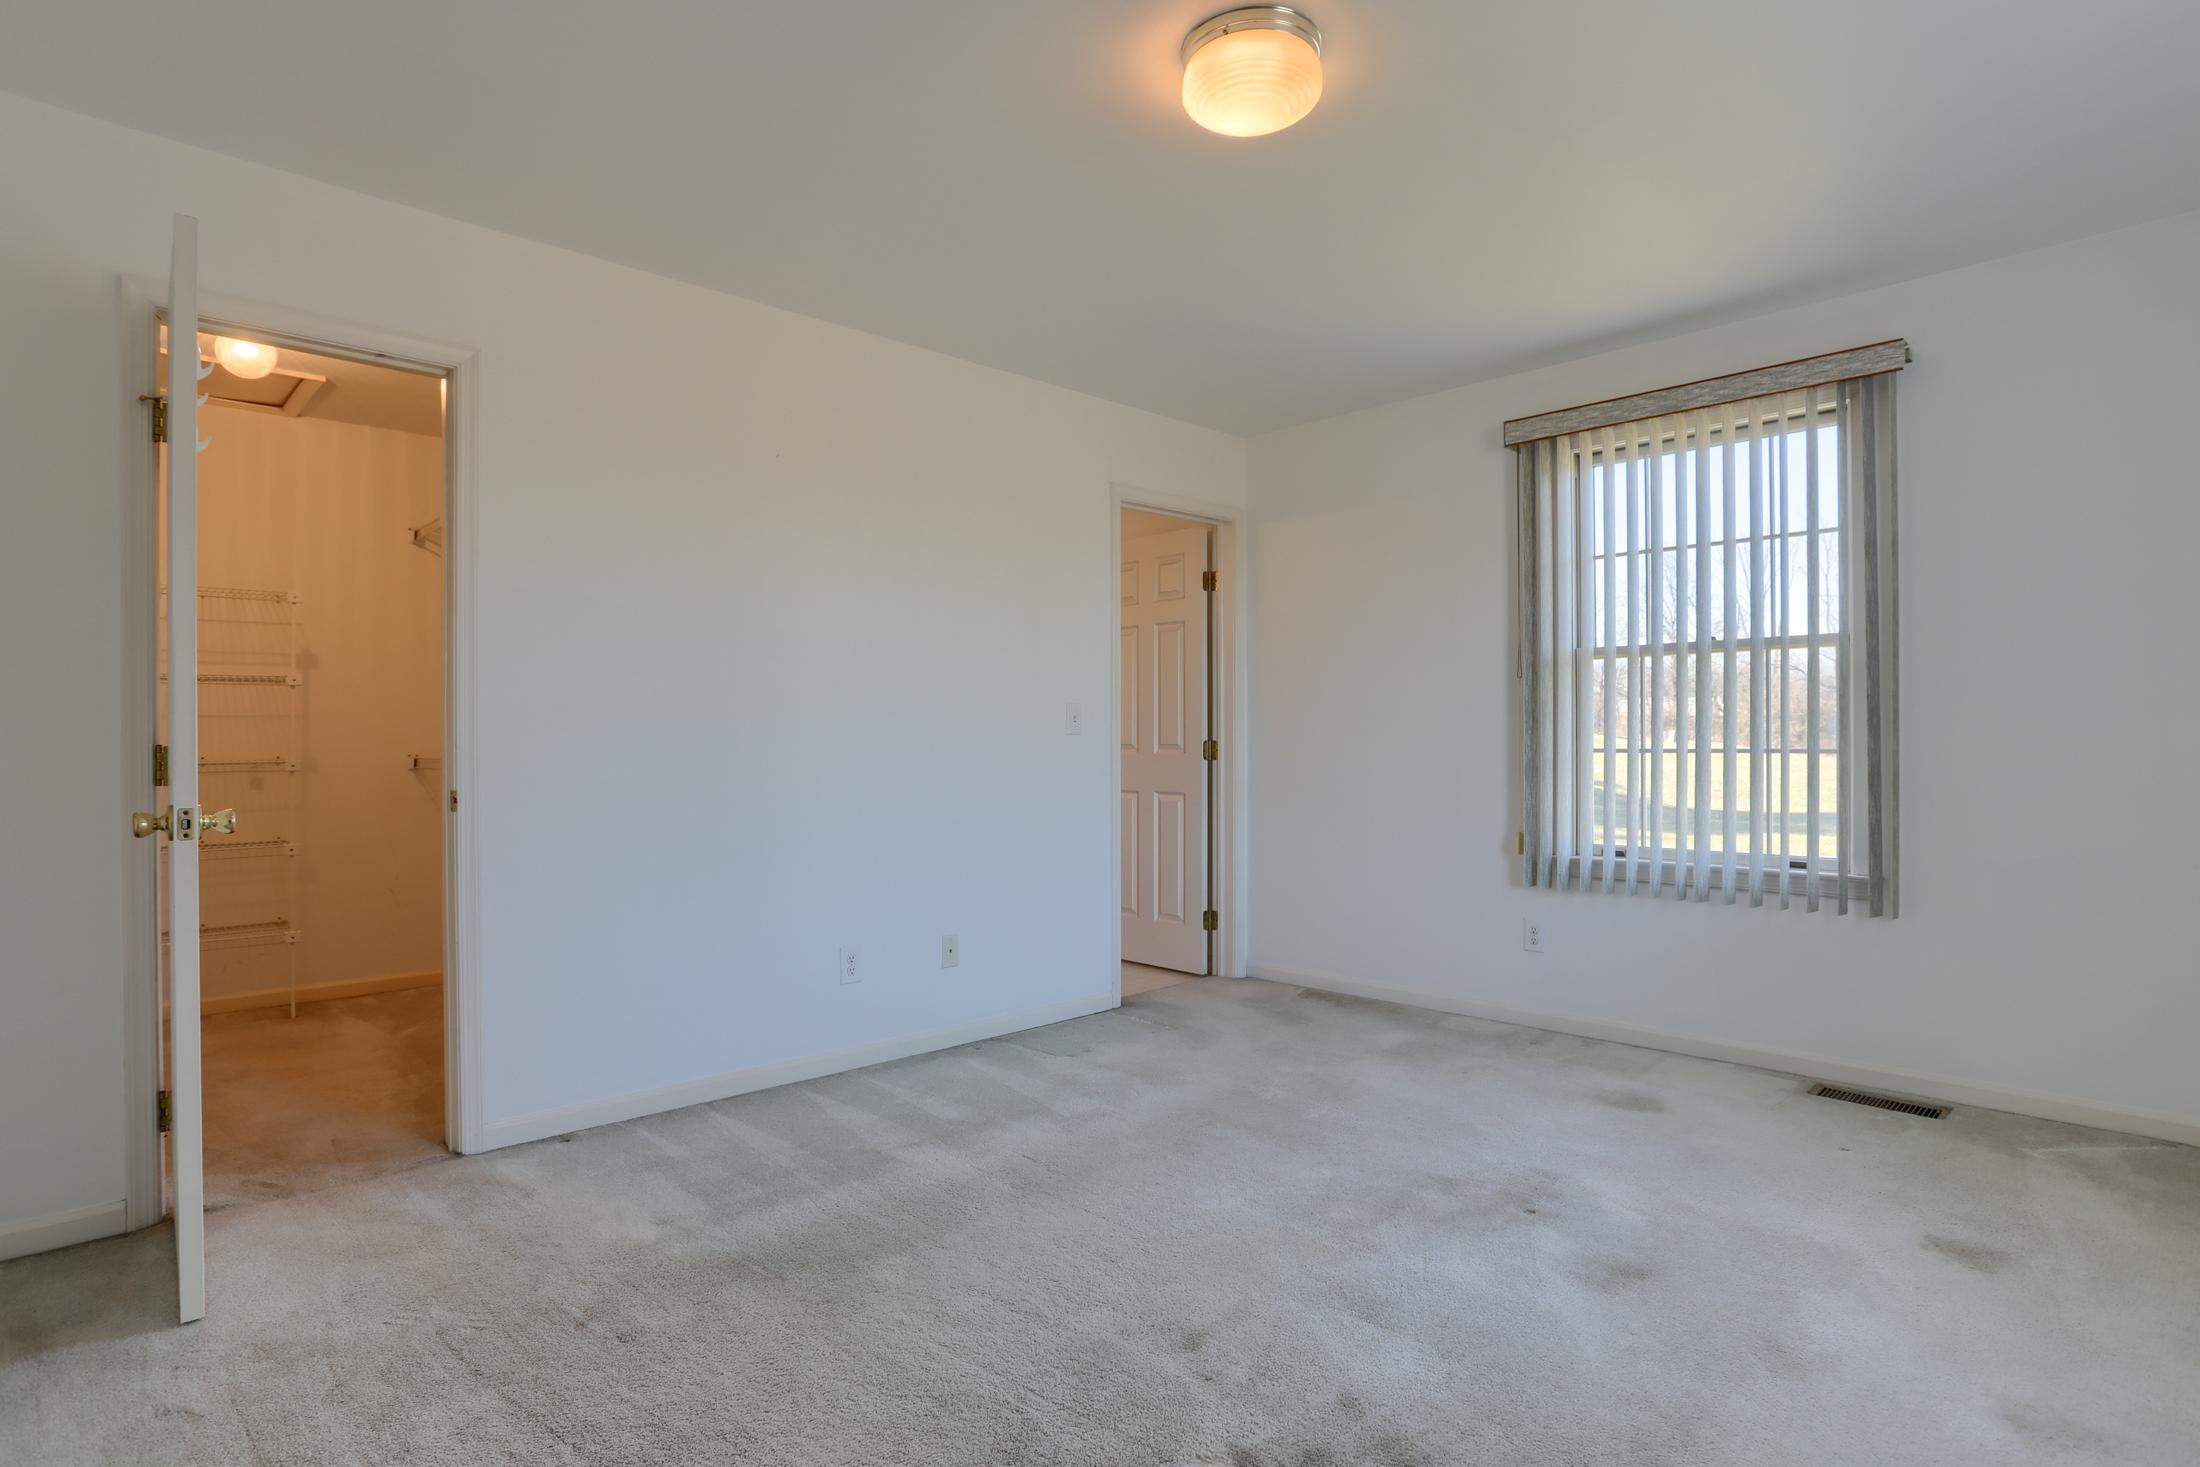 26 W. Strack Drive - Main bedroom